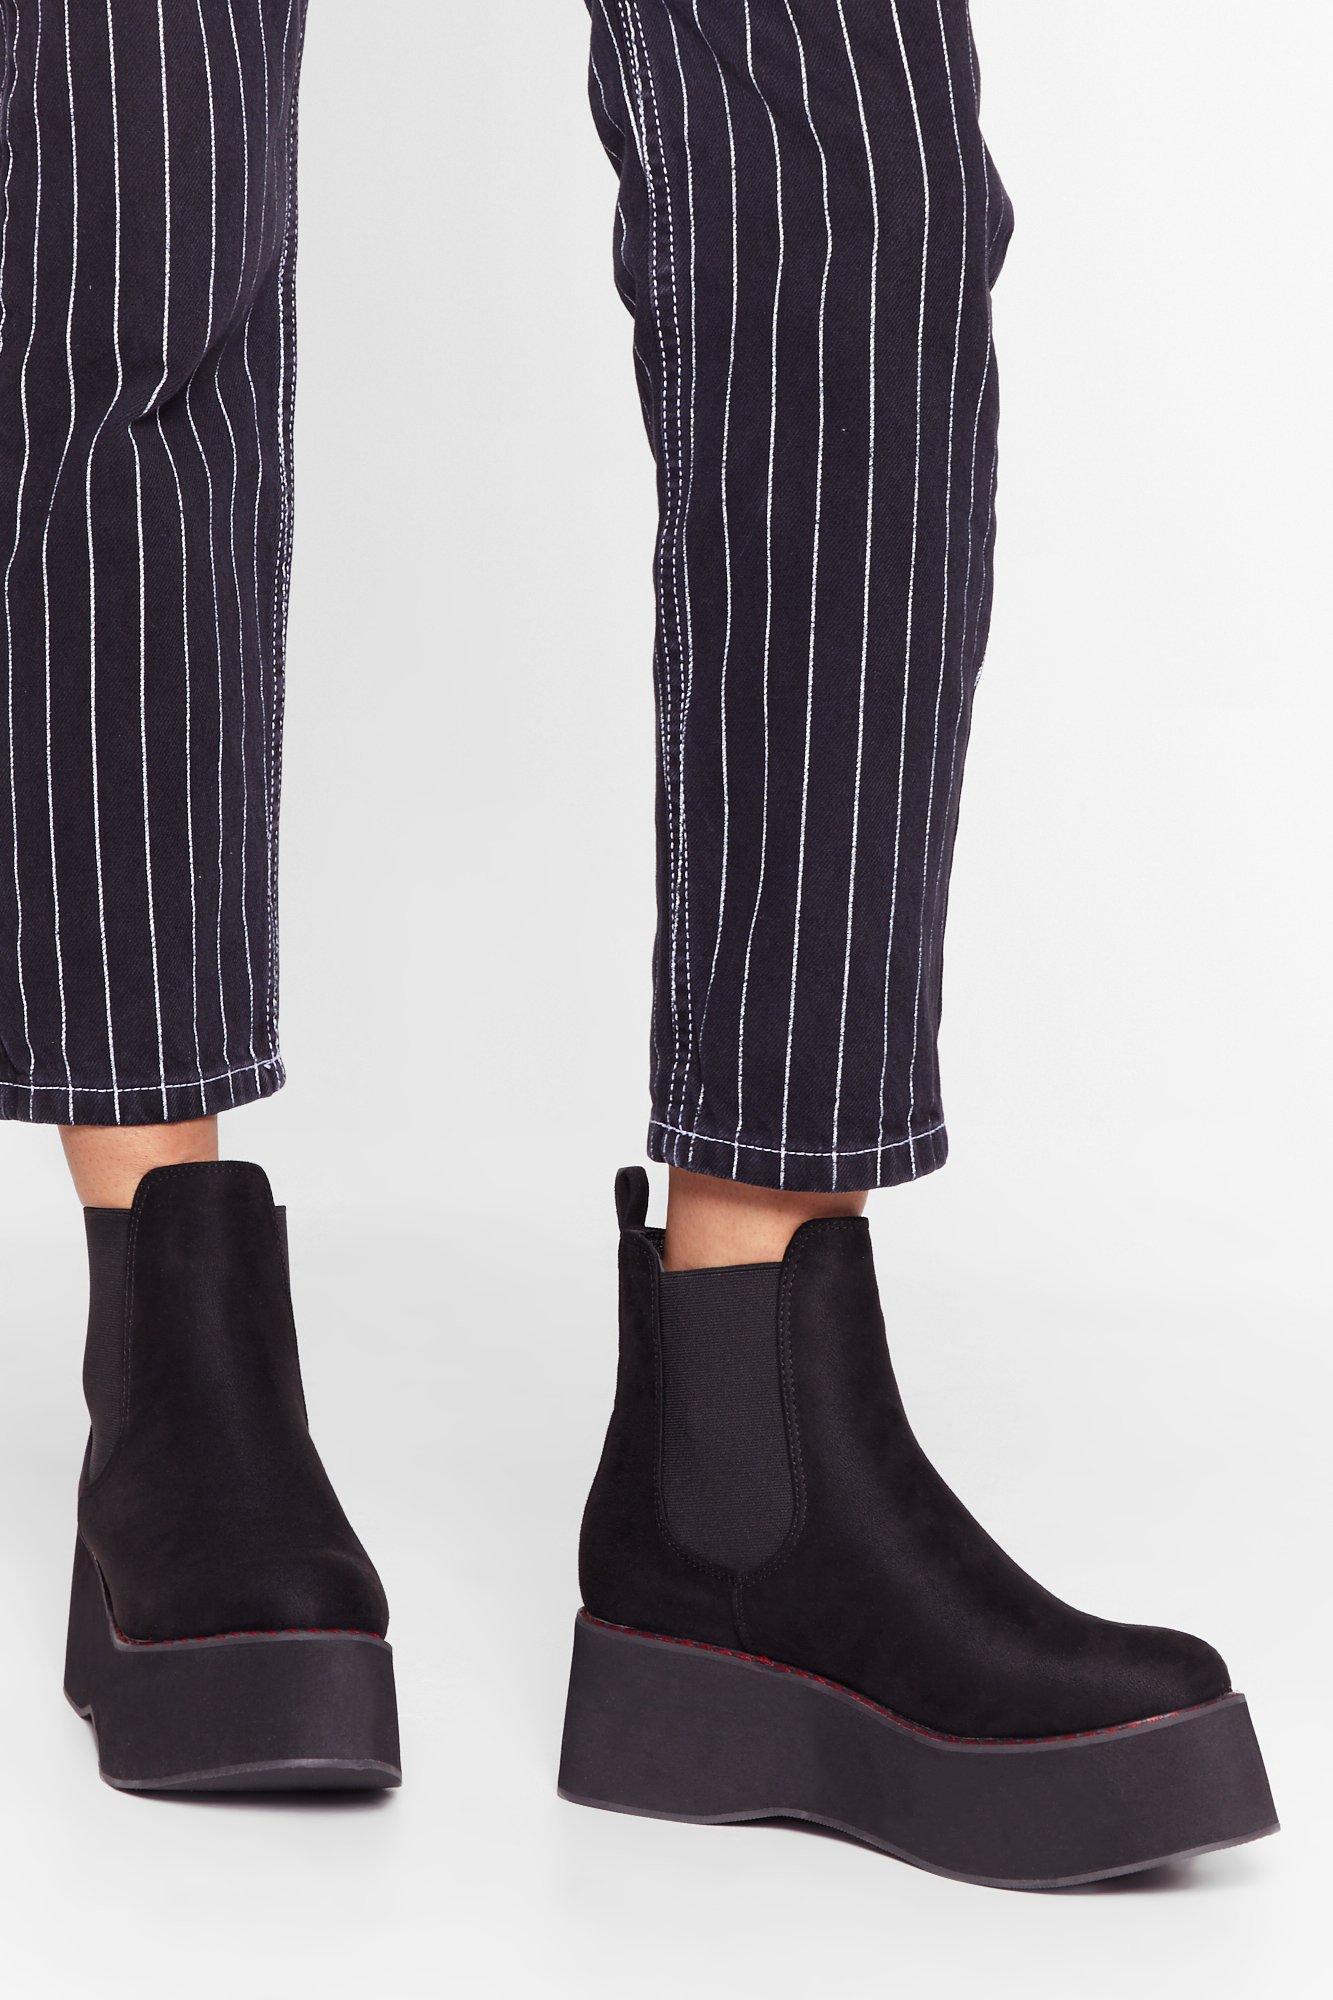 Image of Stitch 'Em Up Faux Suede Platform Boots